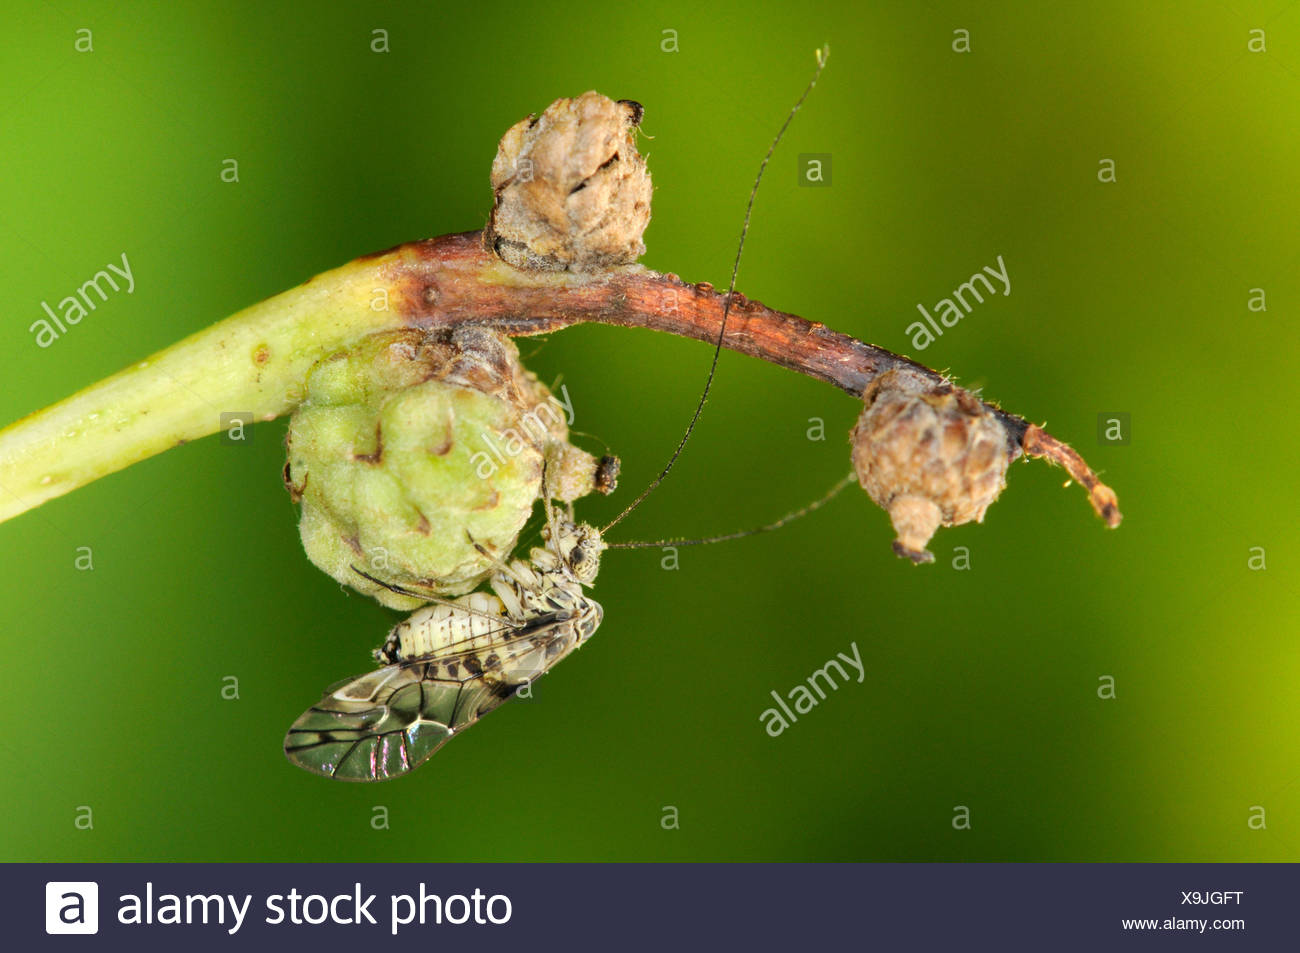 Psocid - Order psocoptera - Stock Image